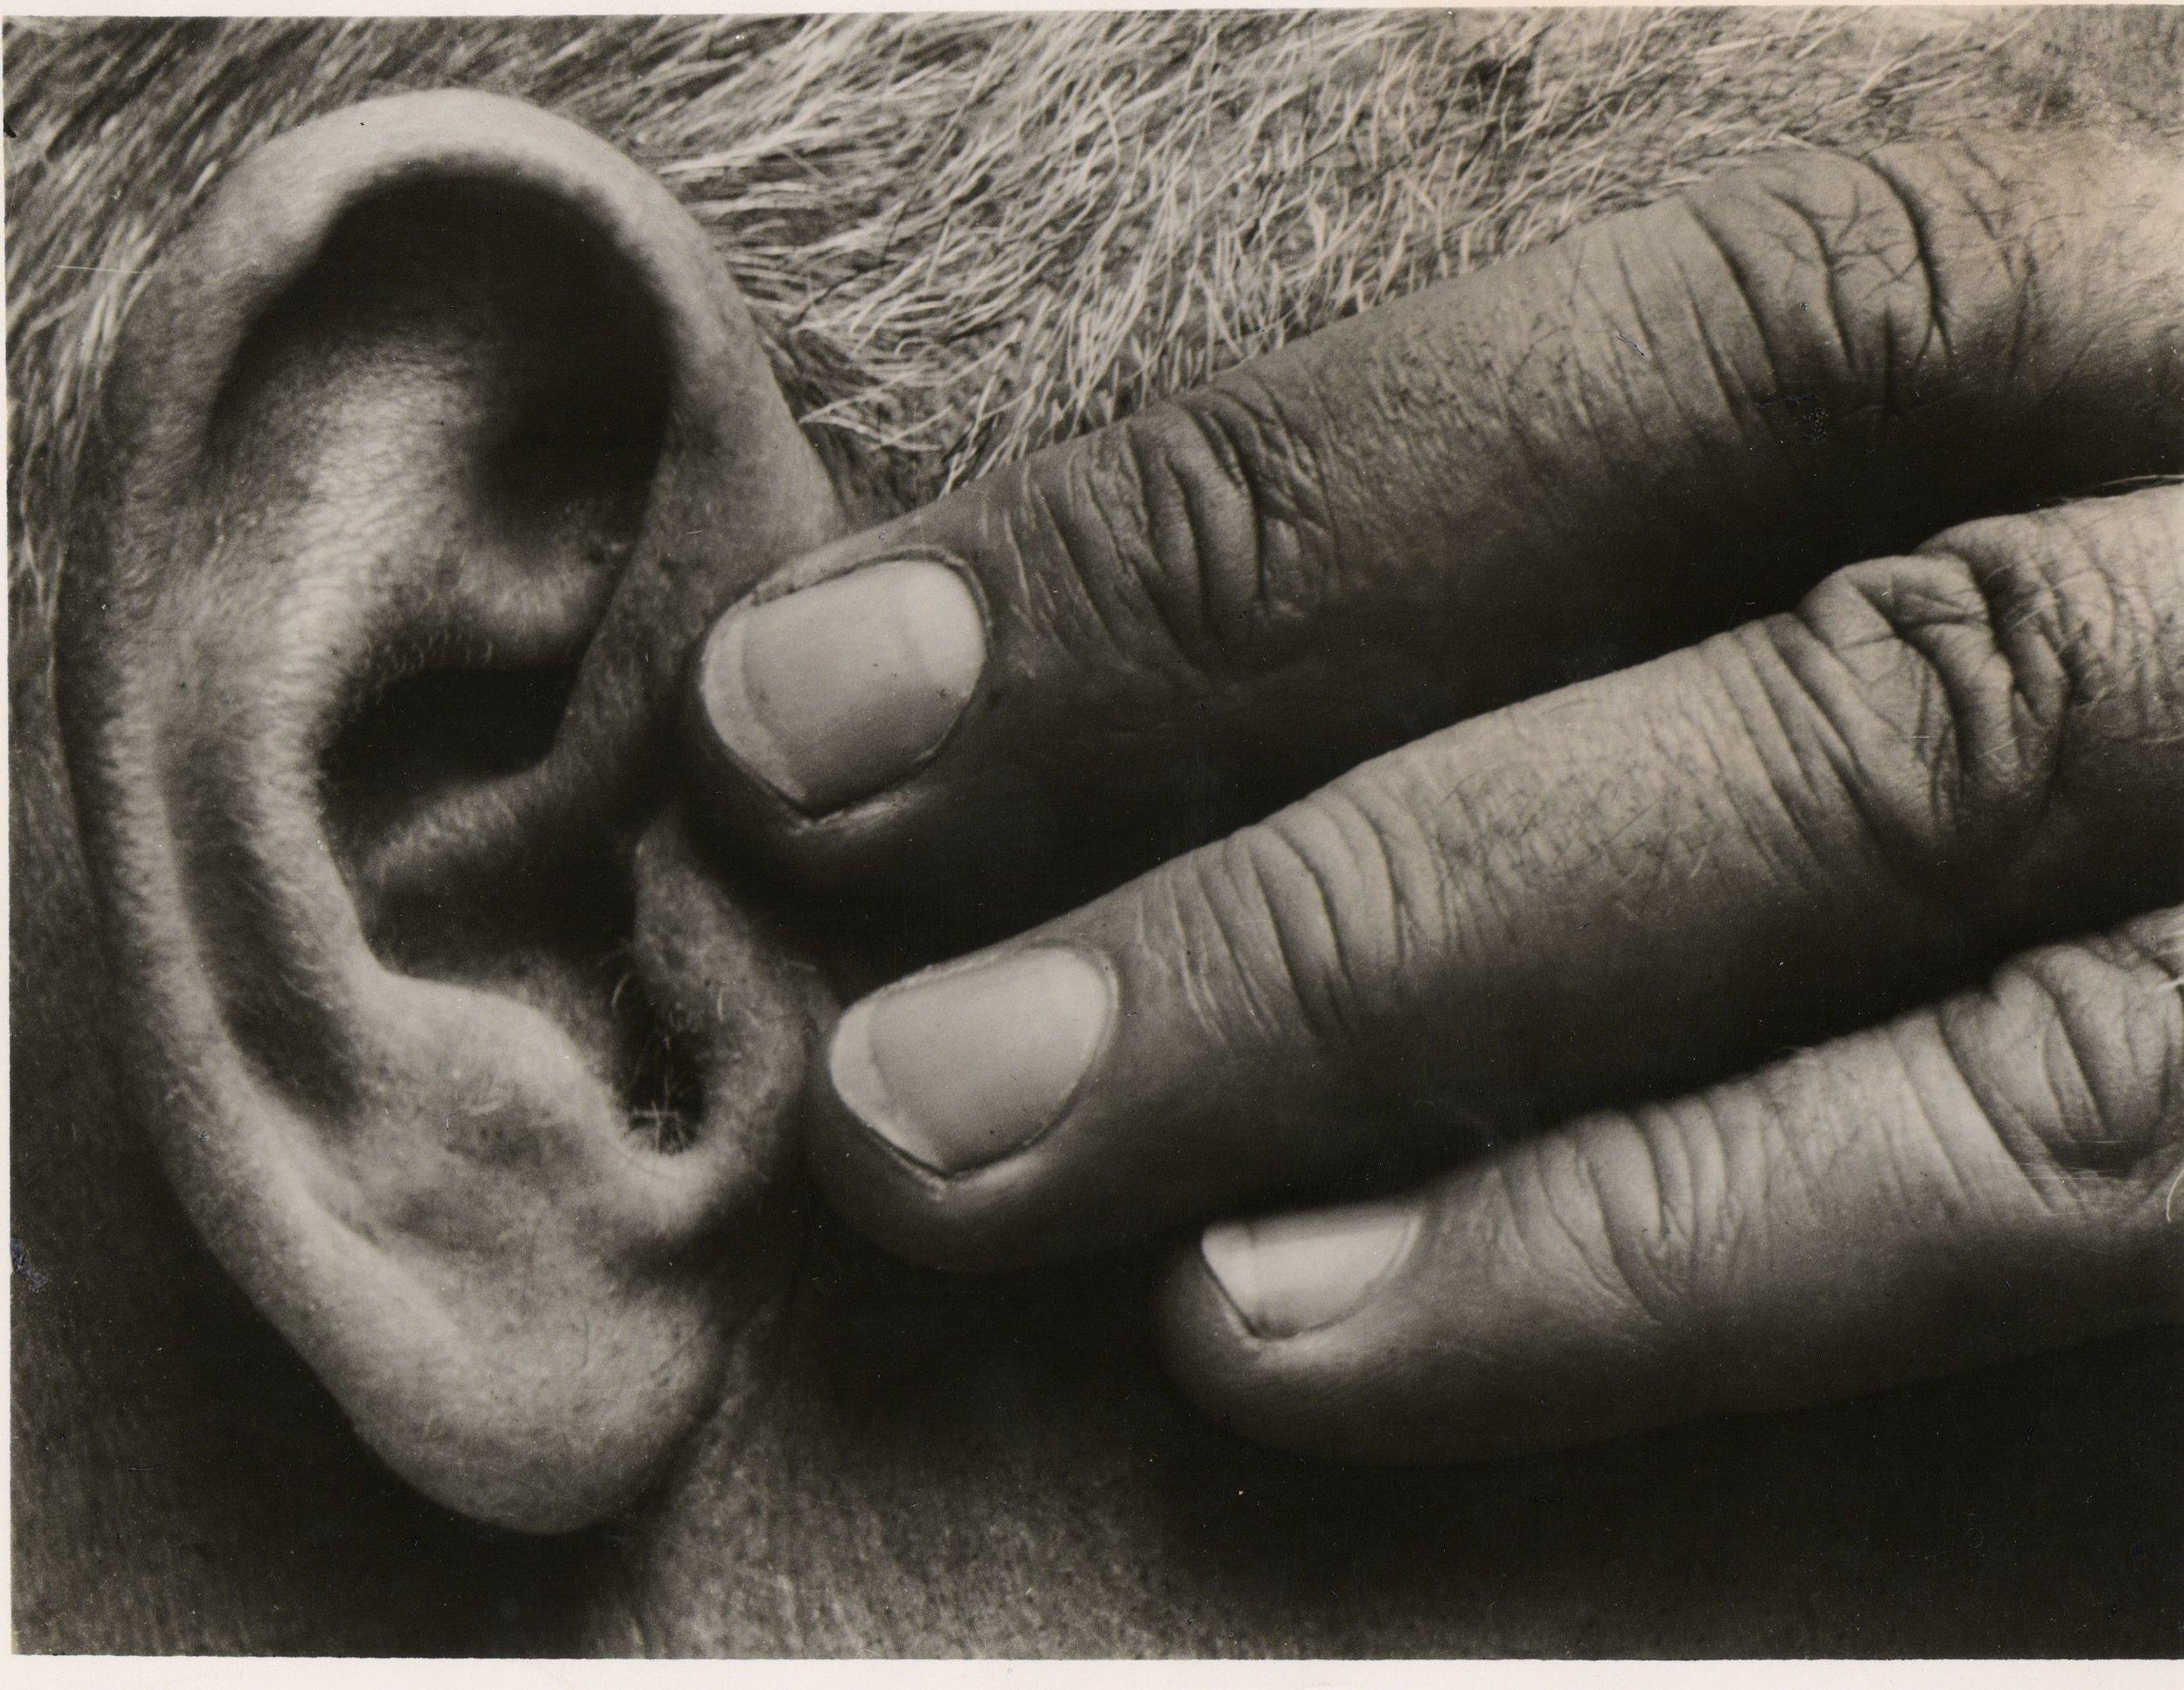 Brett Weston:  Ear and Hand, later MOMA press print.